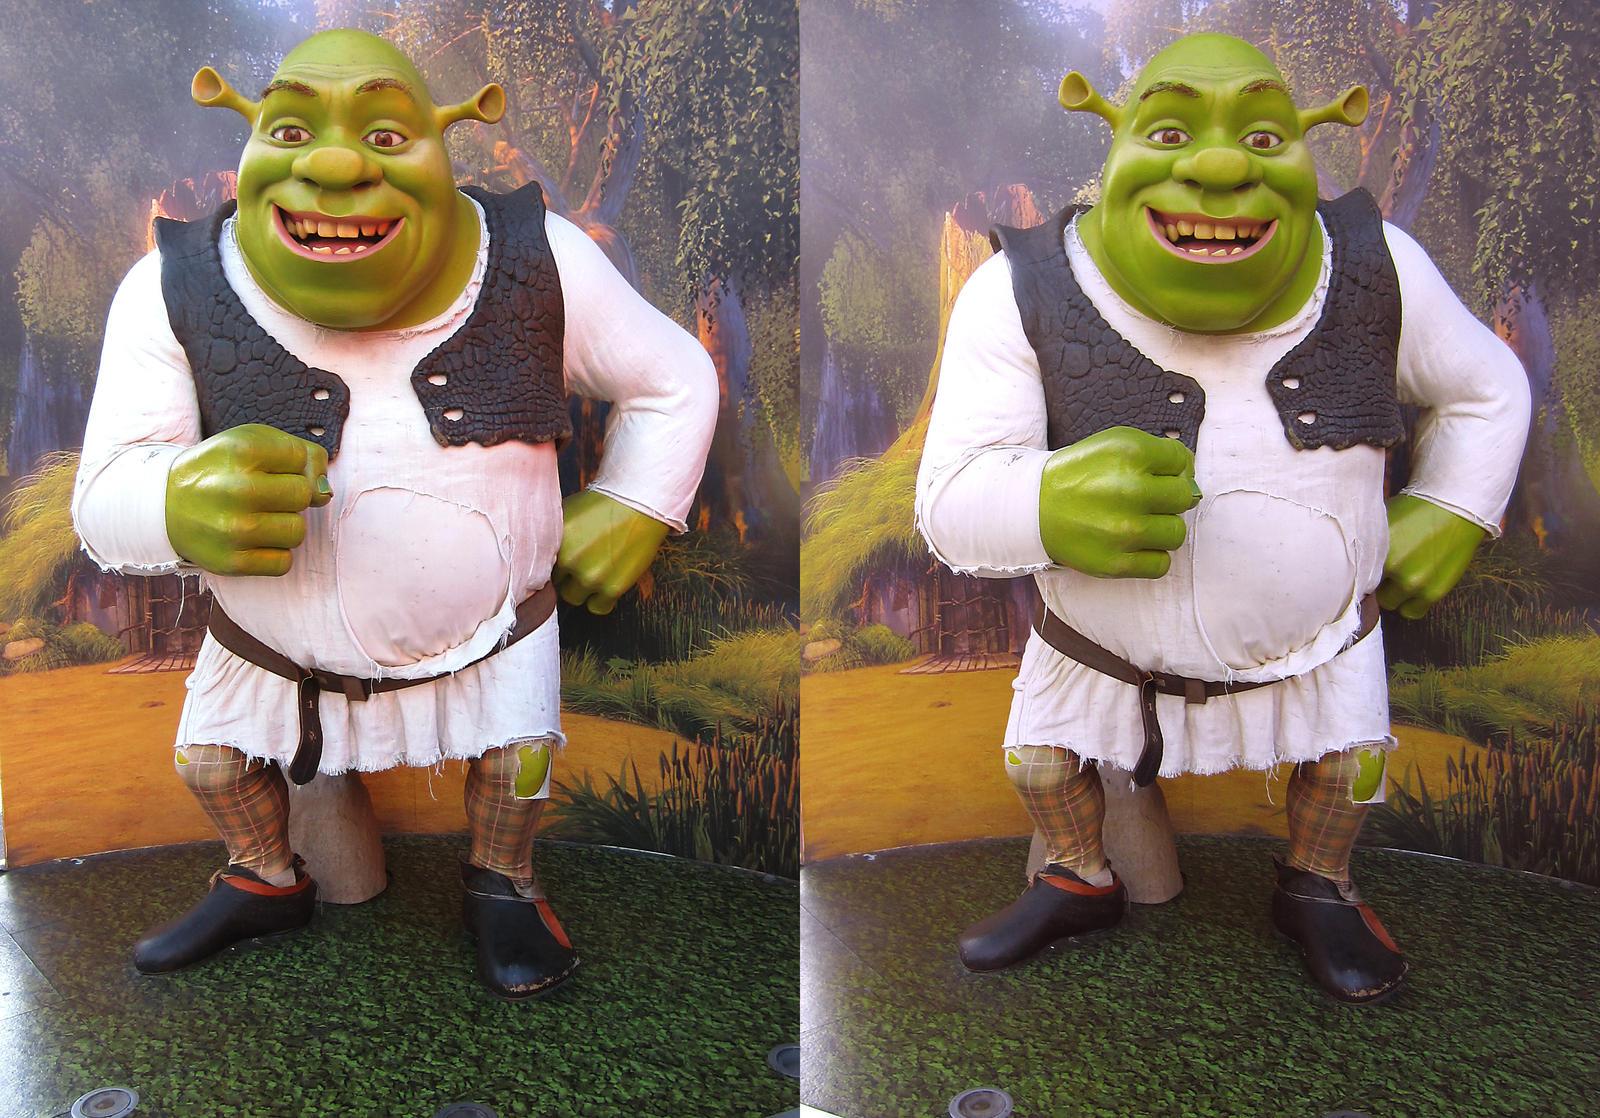 Stereograph - Shrek by alanbecker